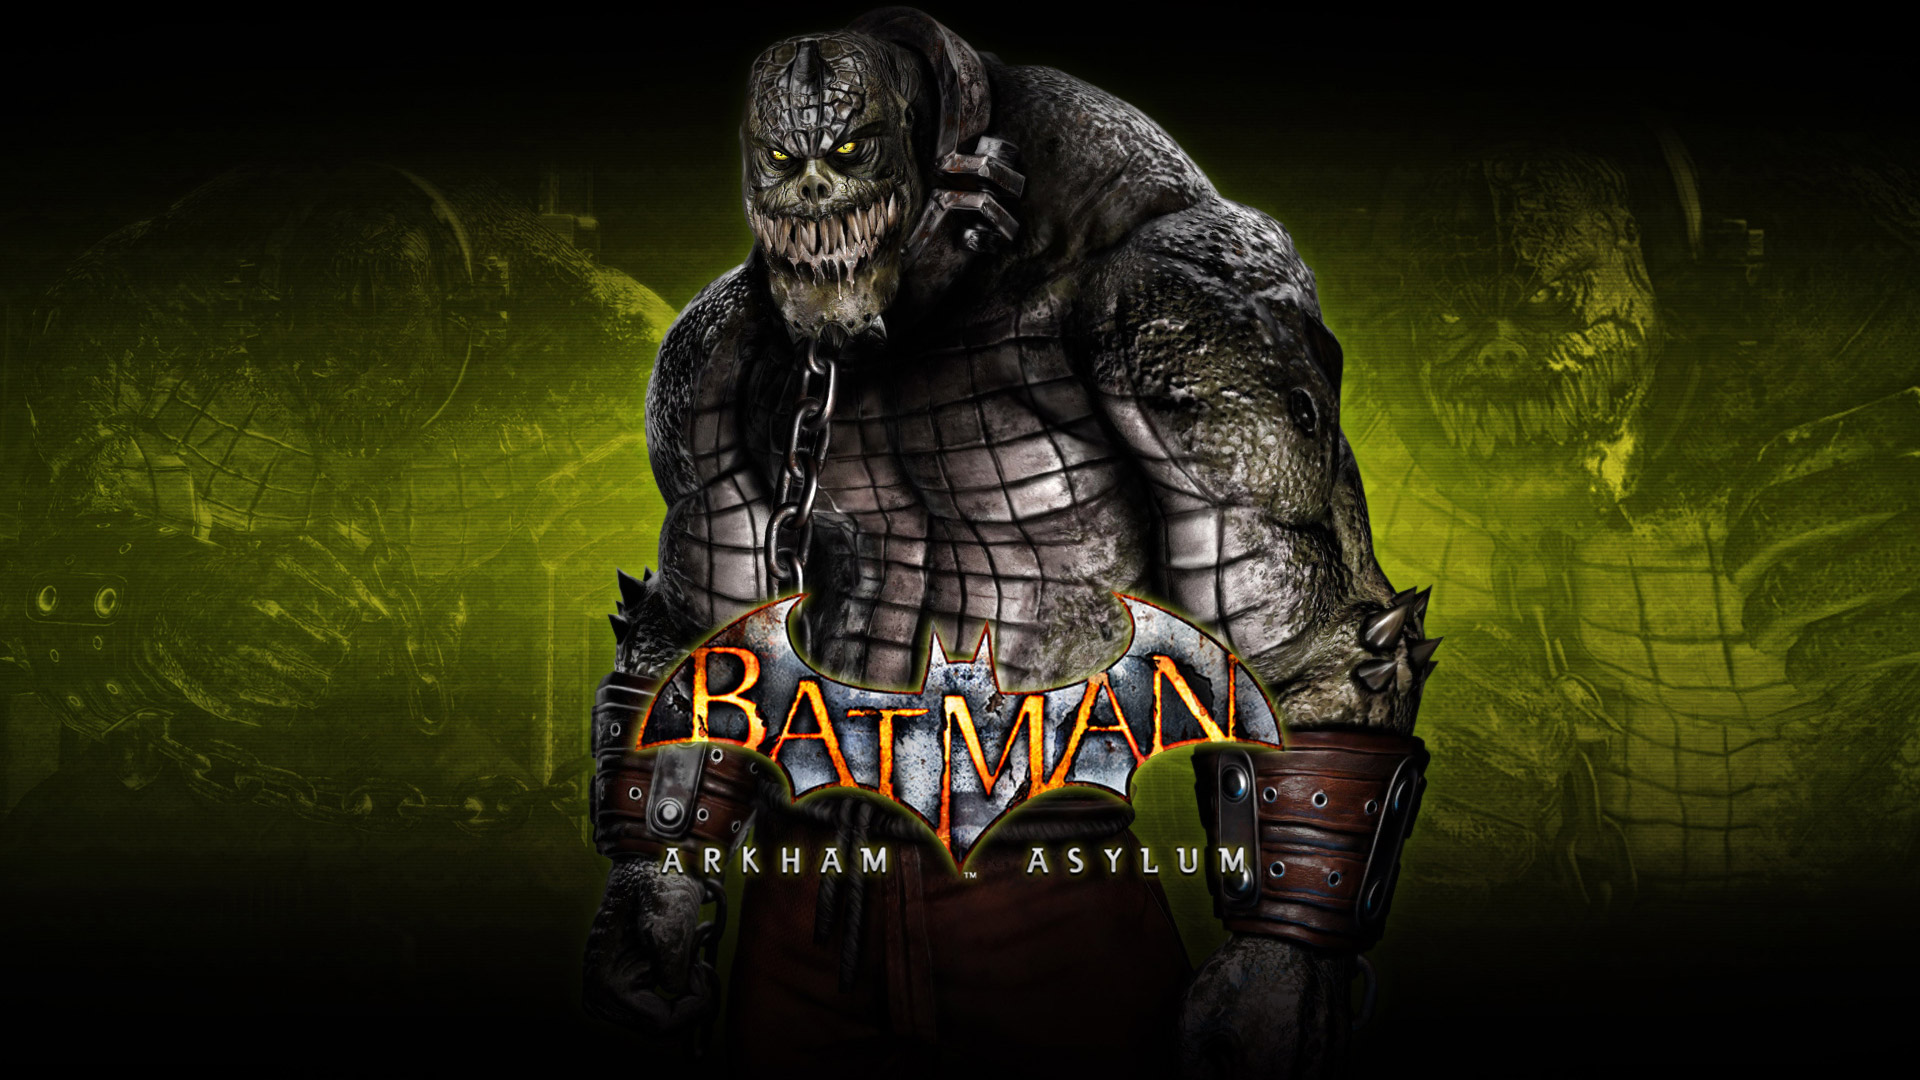 Free Batman: Arkham Asylum Wallpaper in 1920x1080